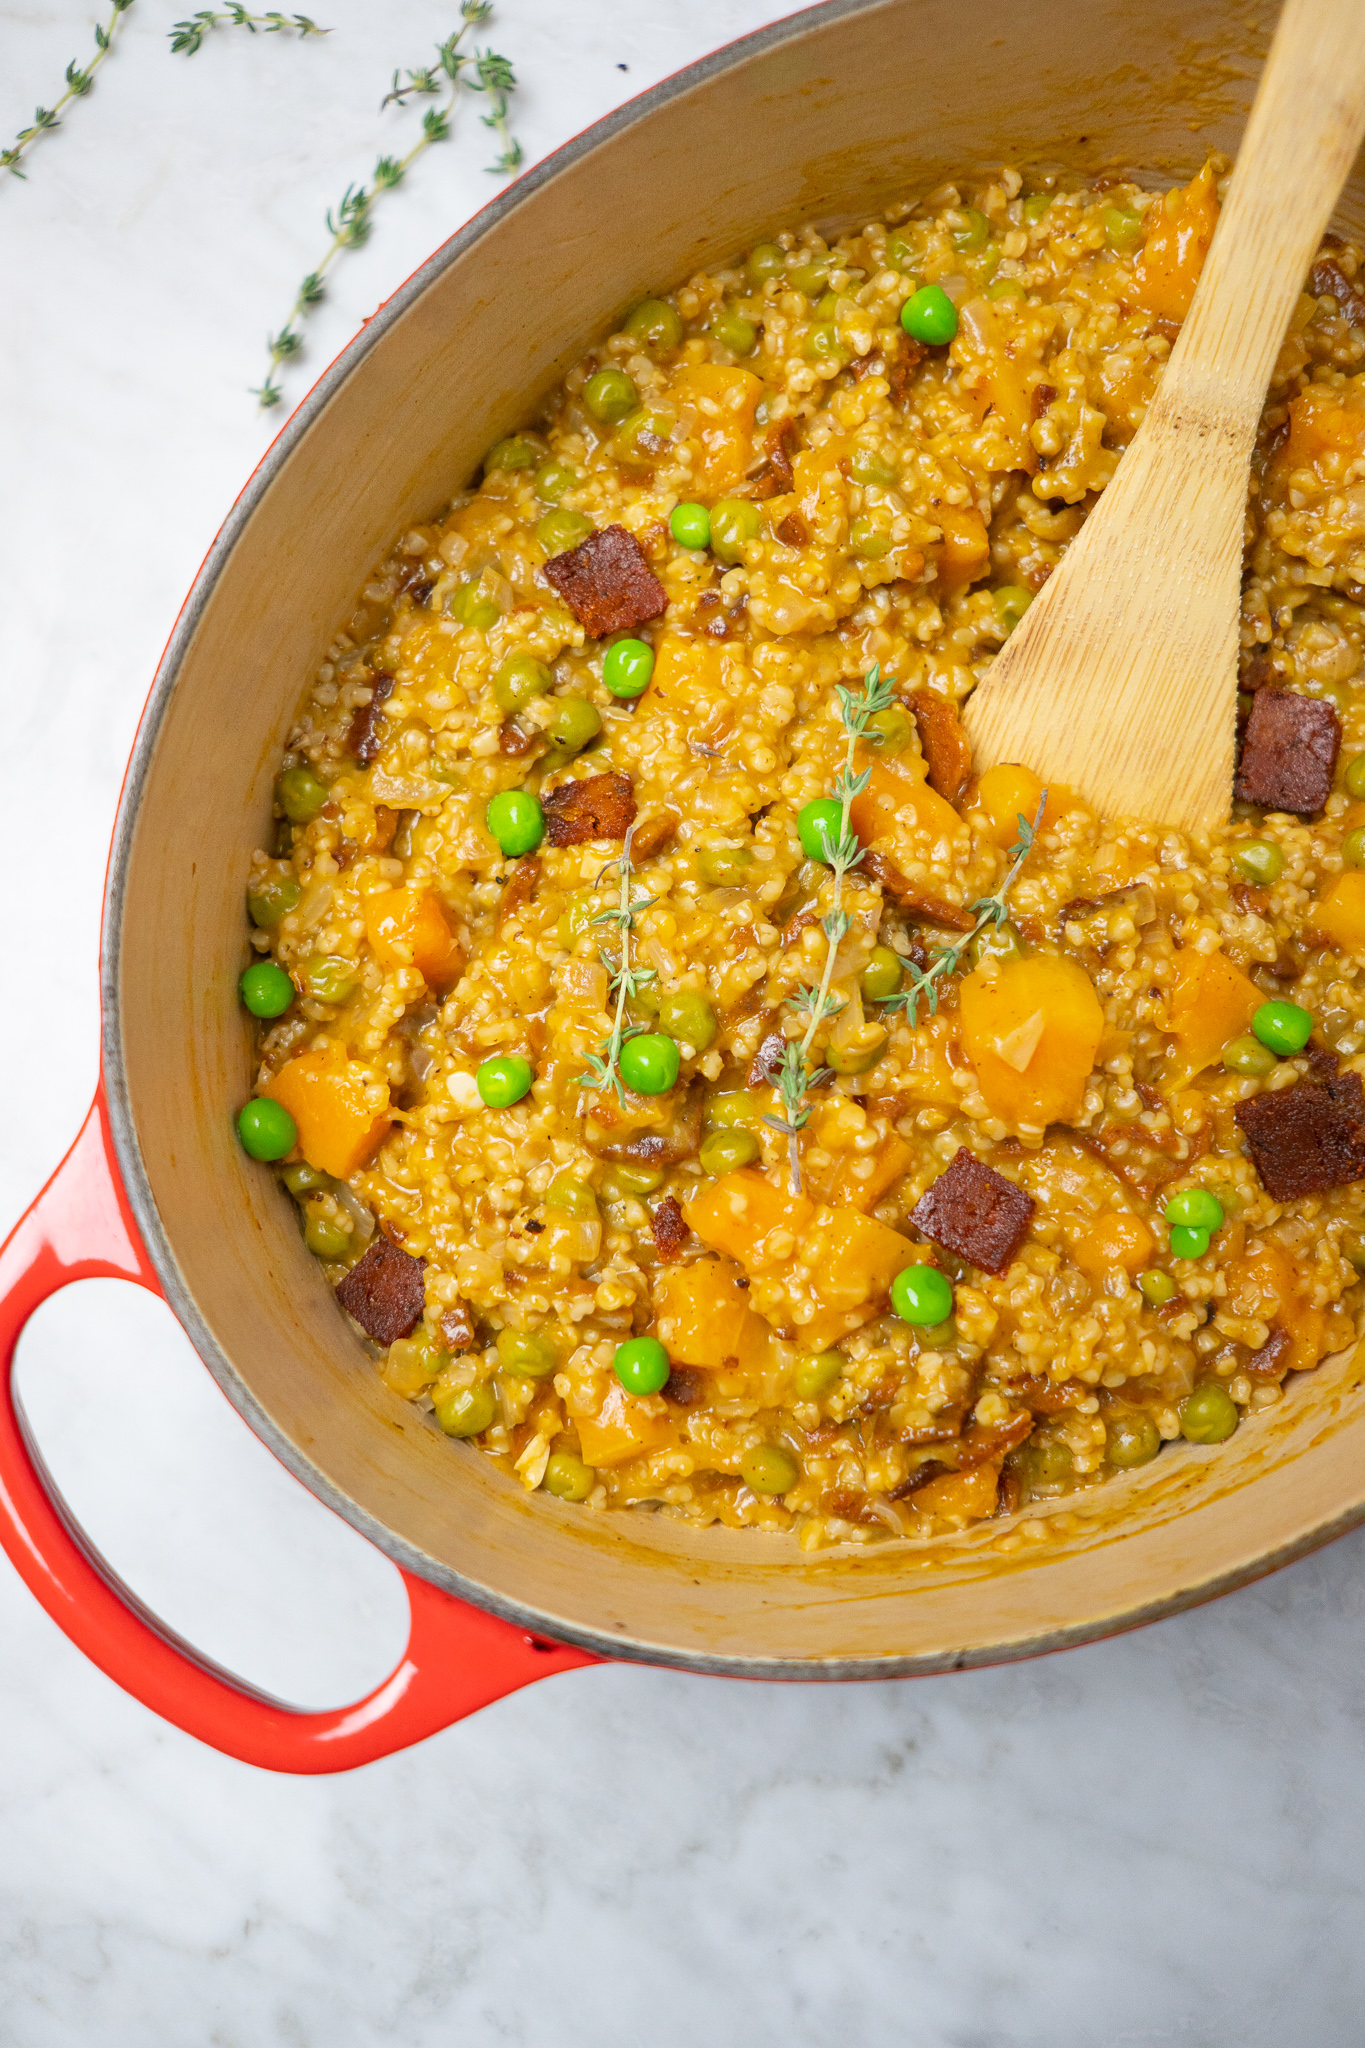 vegan oat risotto